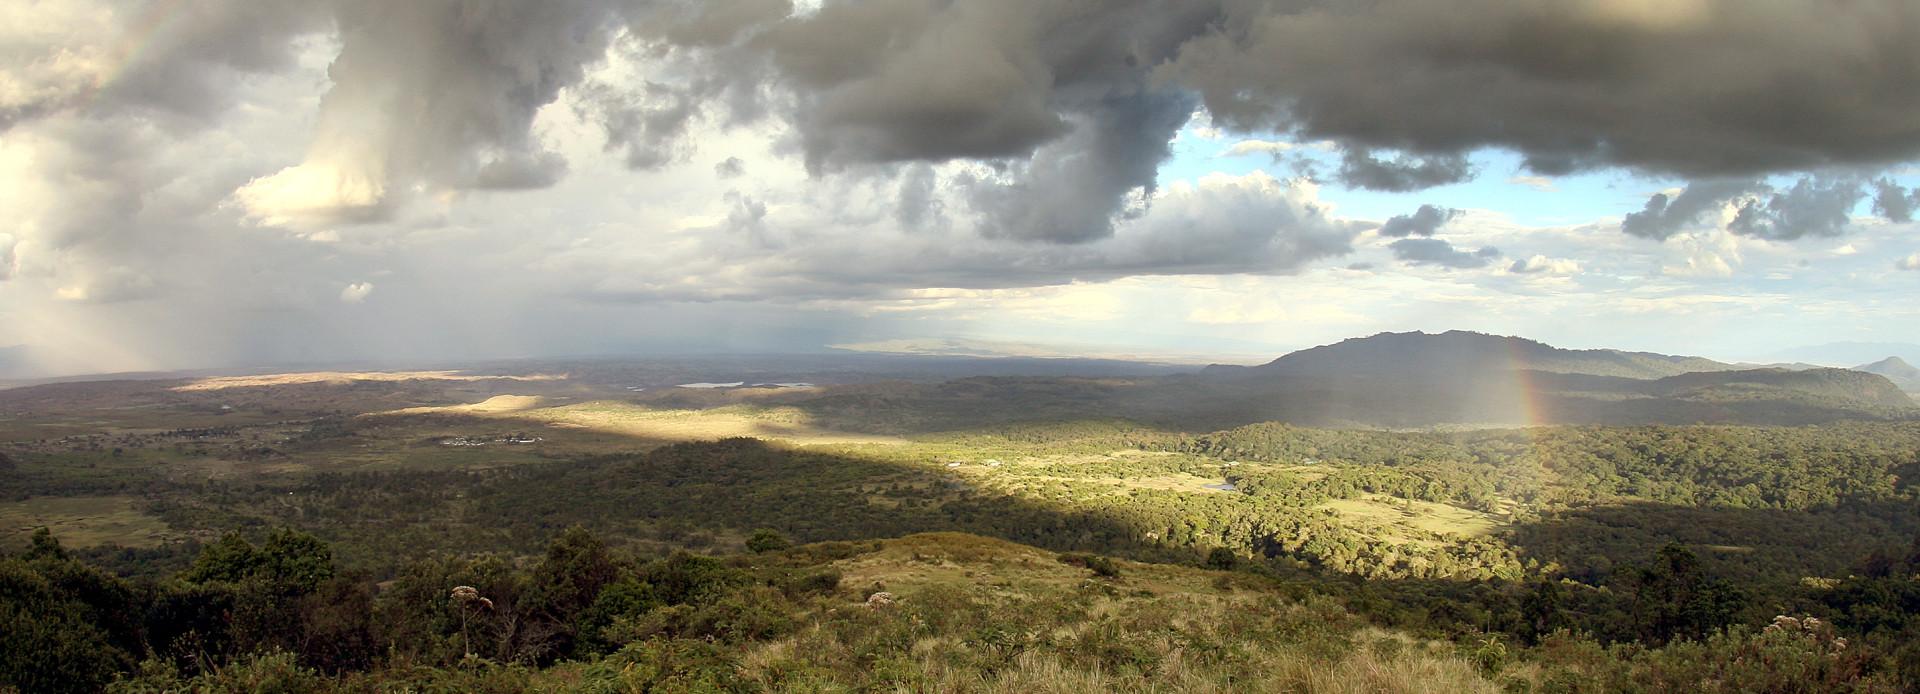 Tanzania Regenbogen im Arusha Park